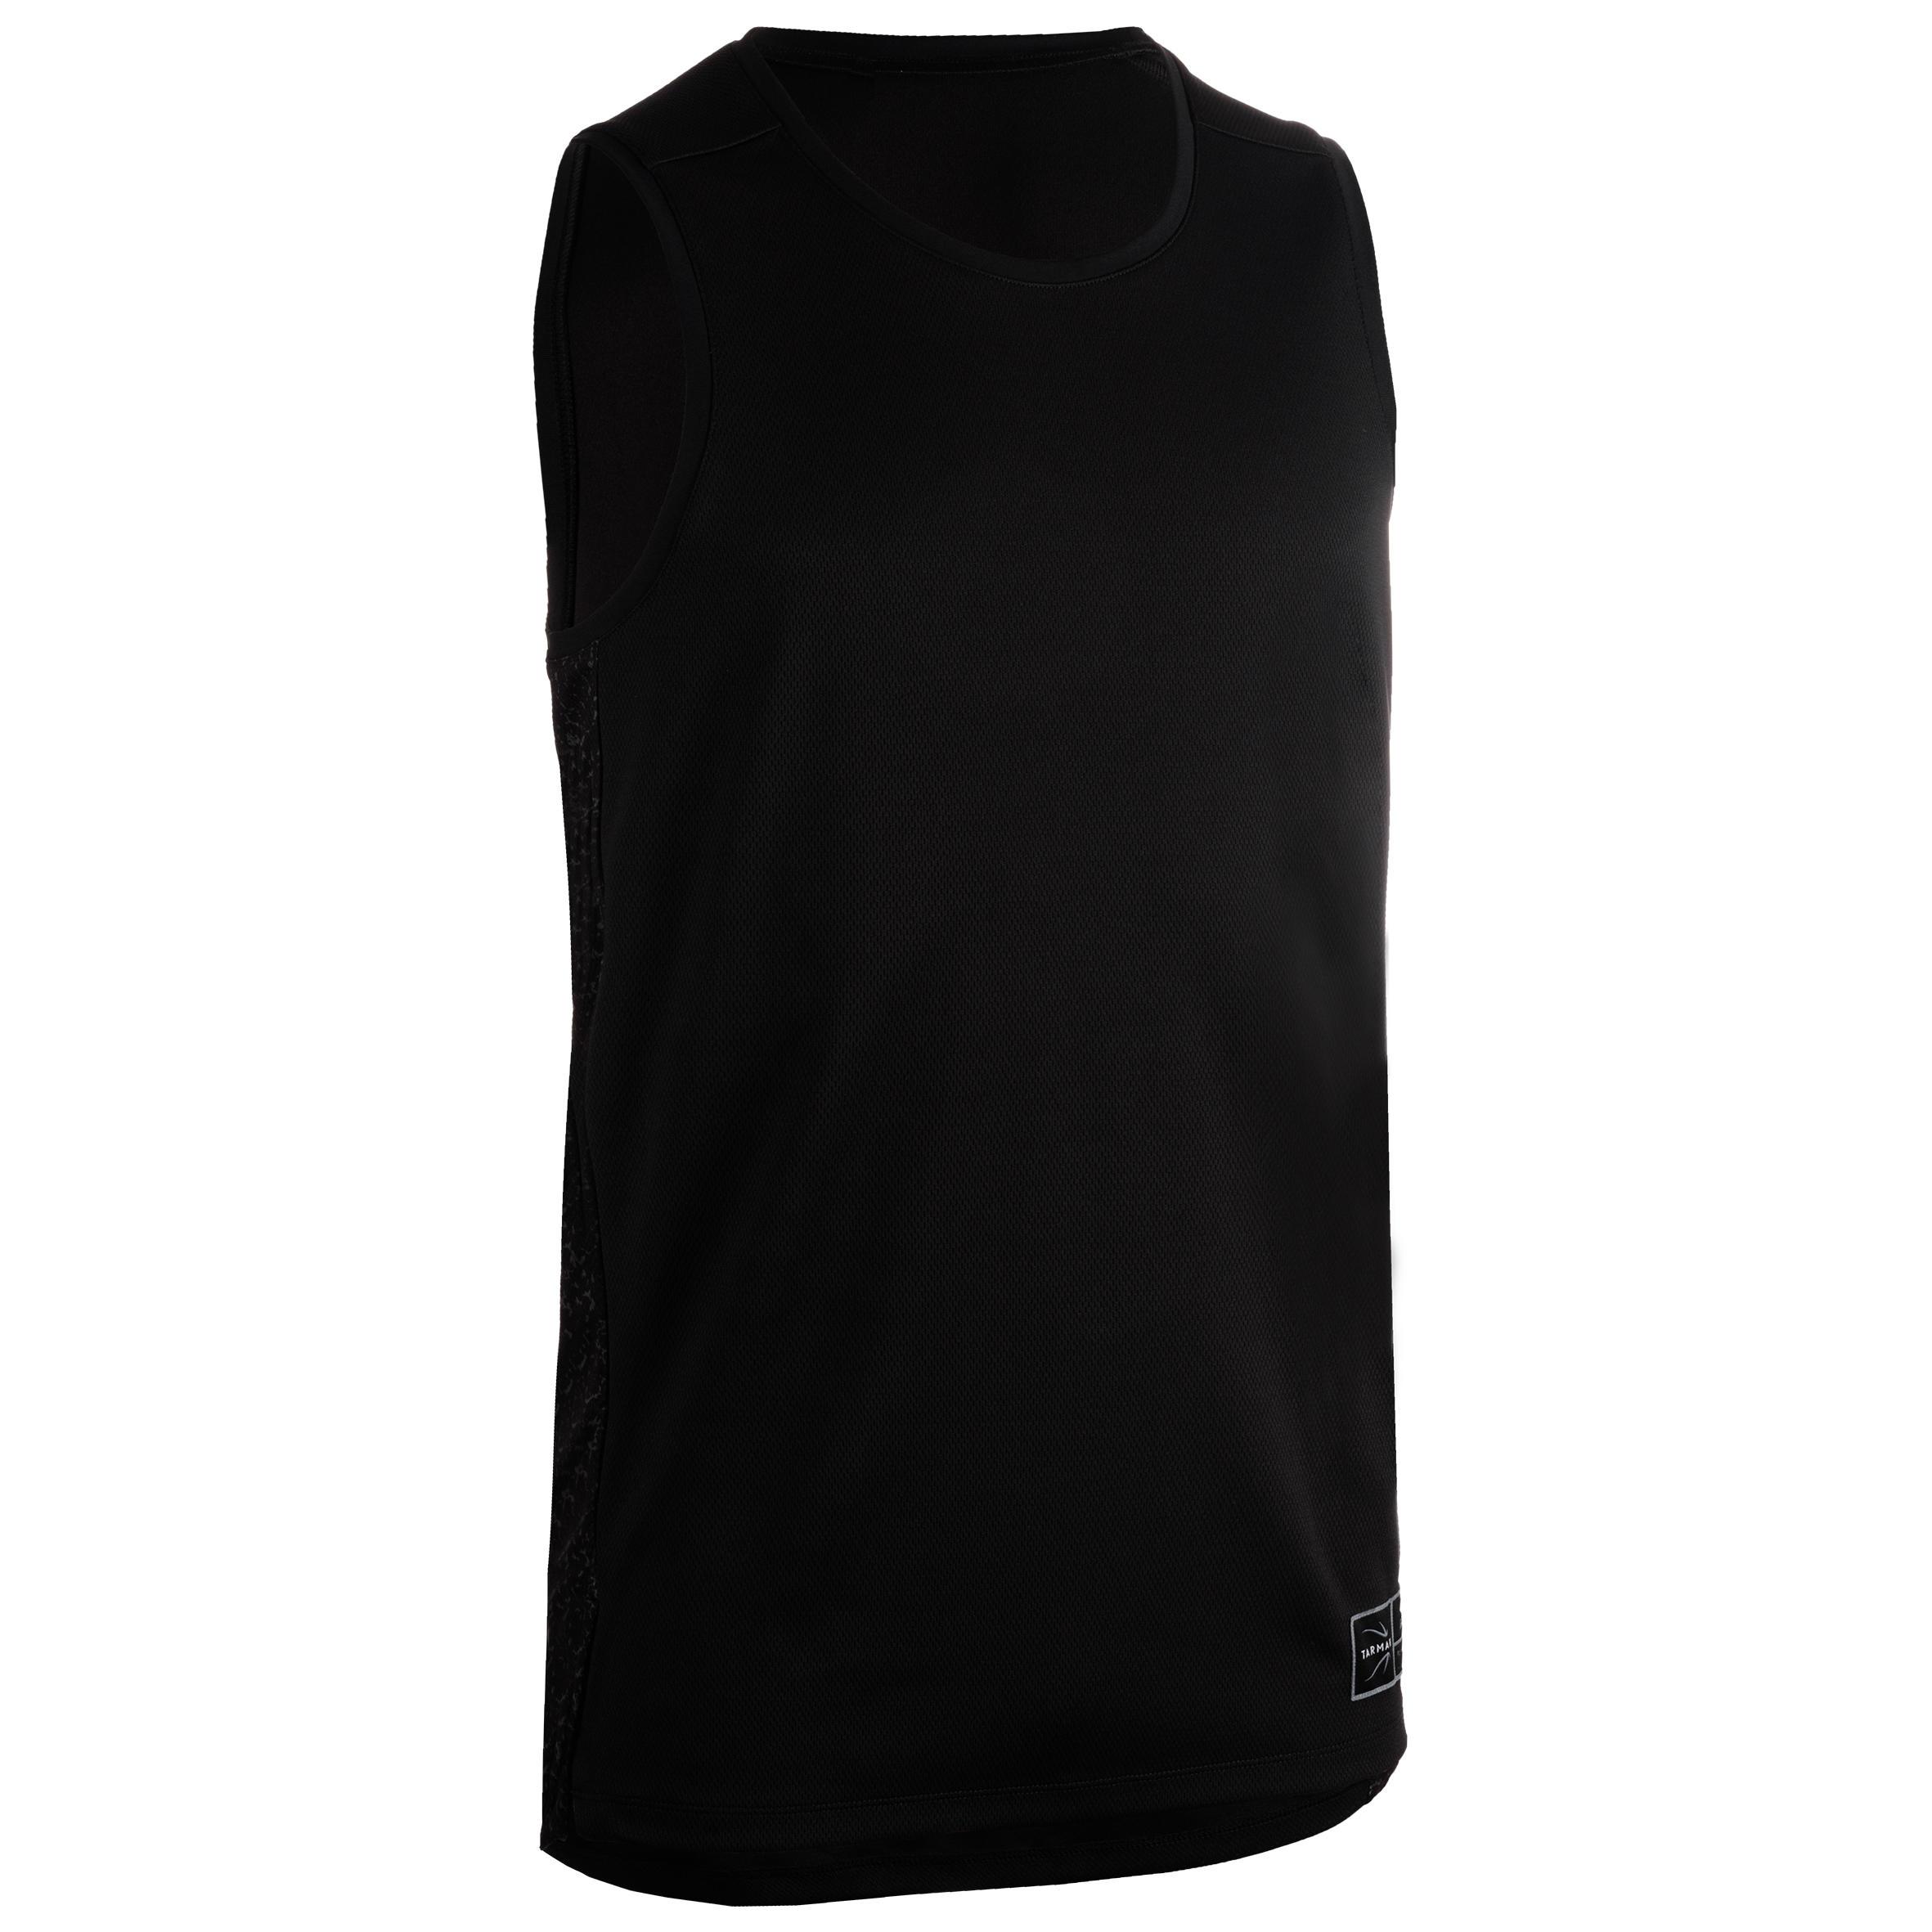 Tarmak Basketbalshirt T500 zwart/grijs (heren)